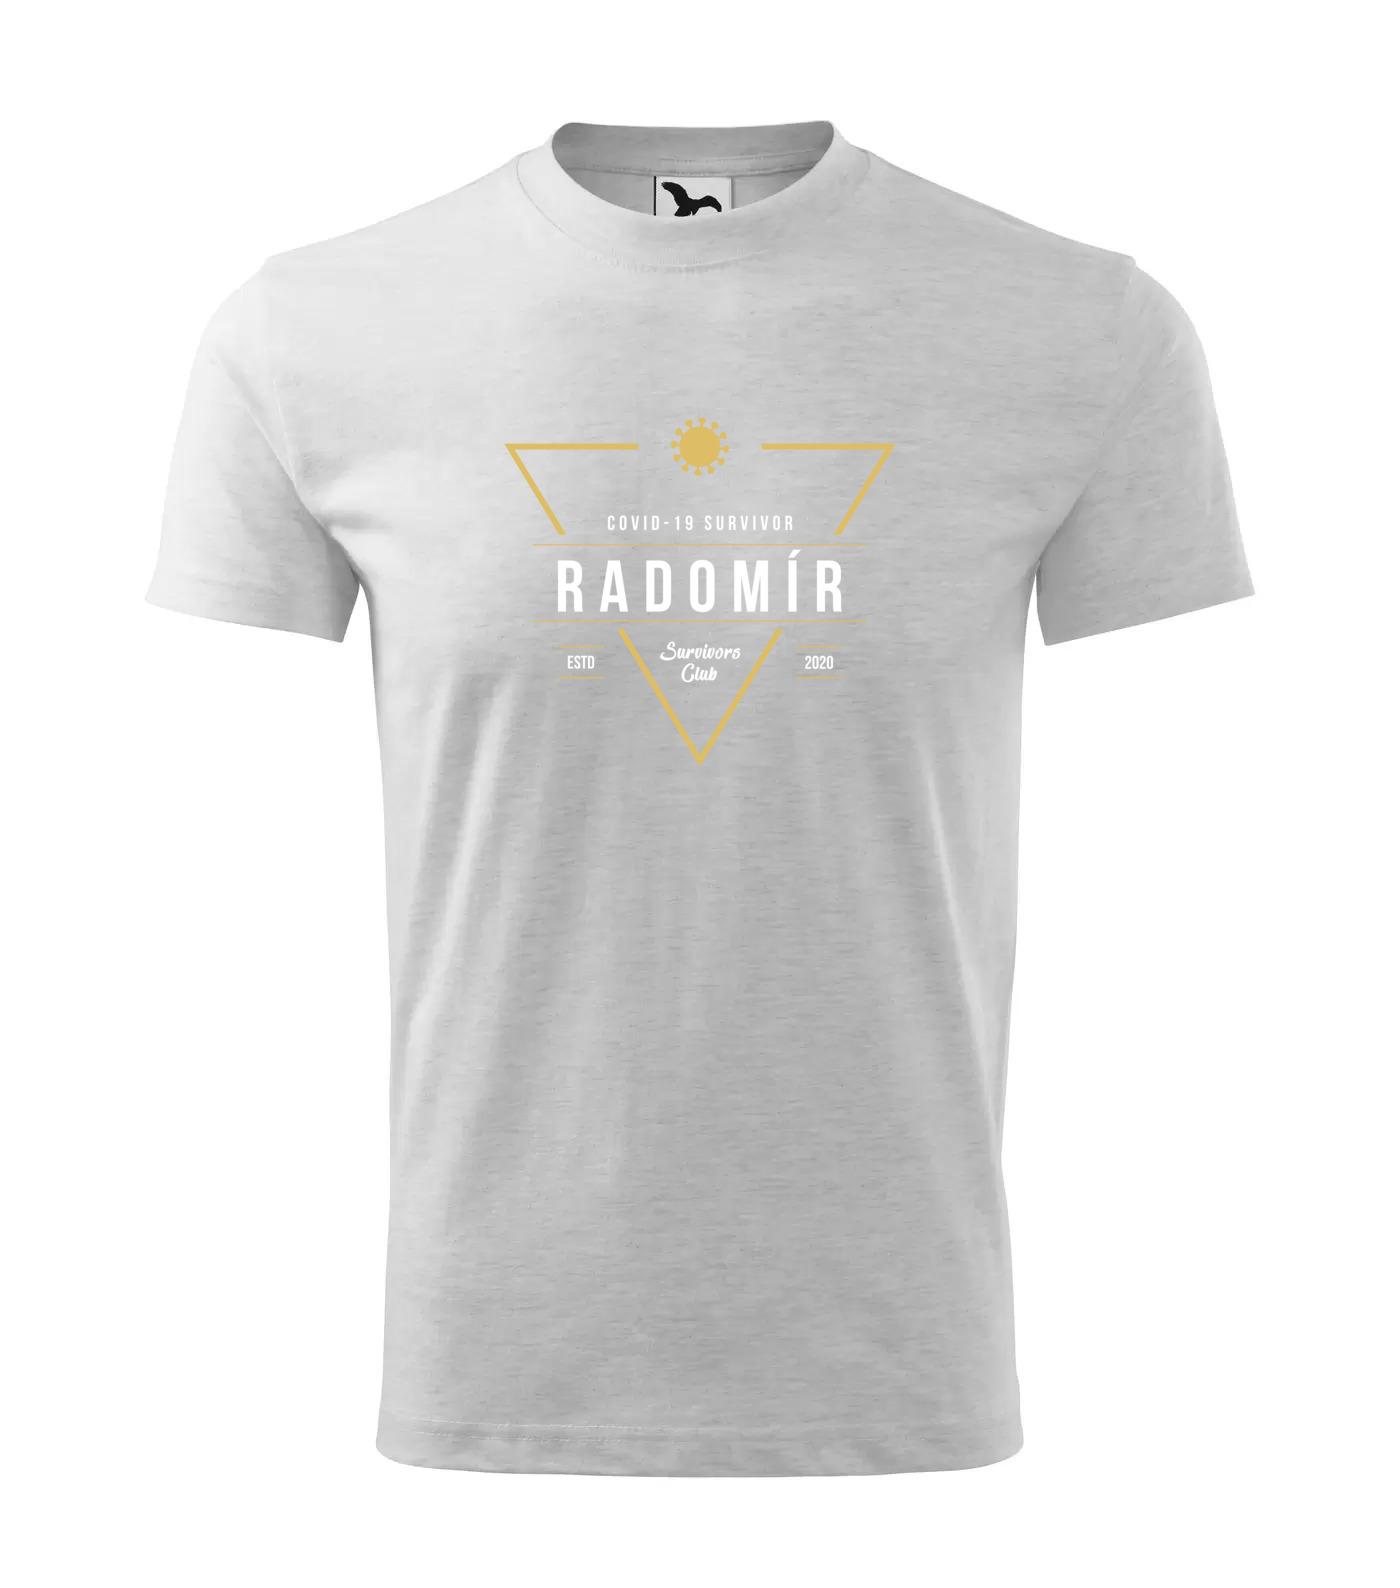 Tričko Survivor Club Radomír